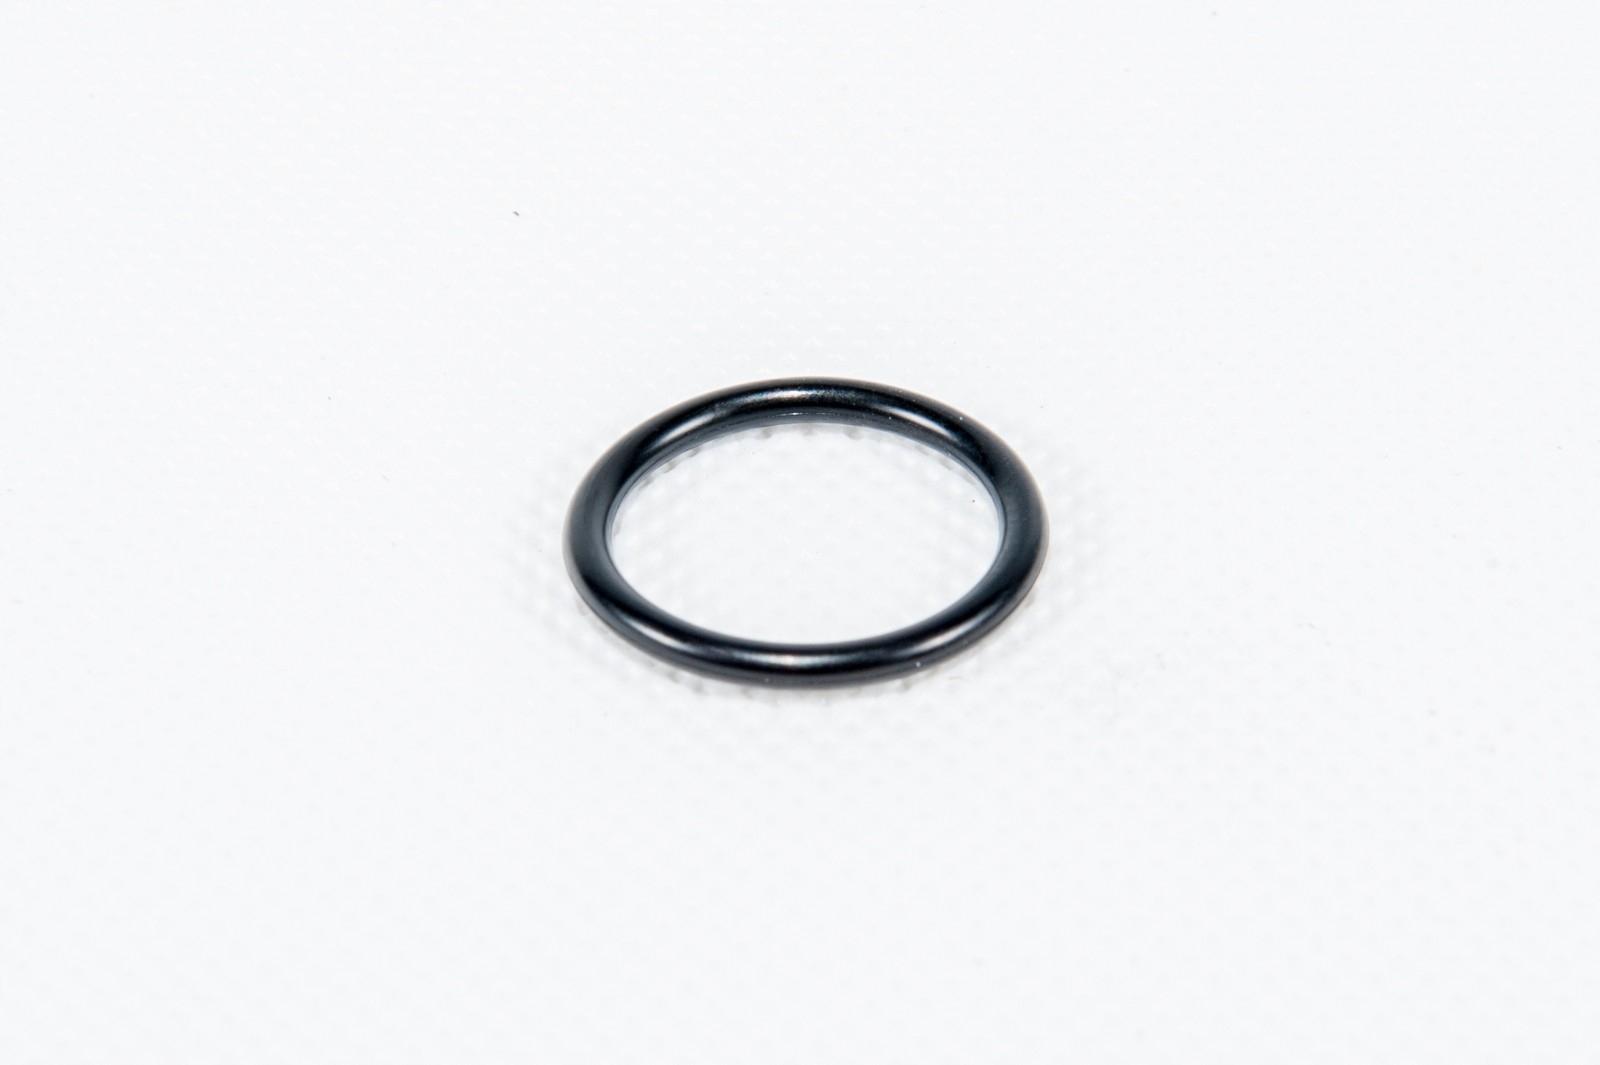 Oring obudowy rozrządu Subaru Legacy H6 OEM 806919120